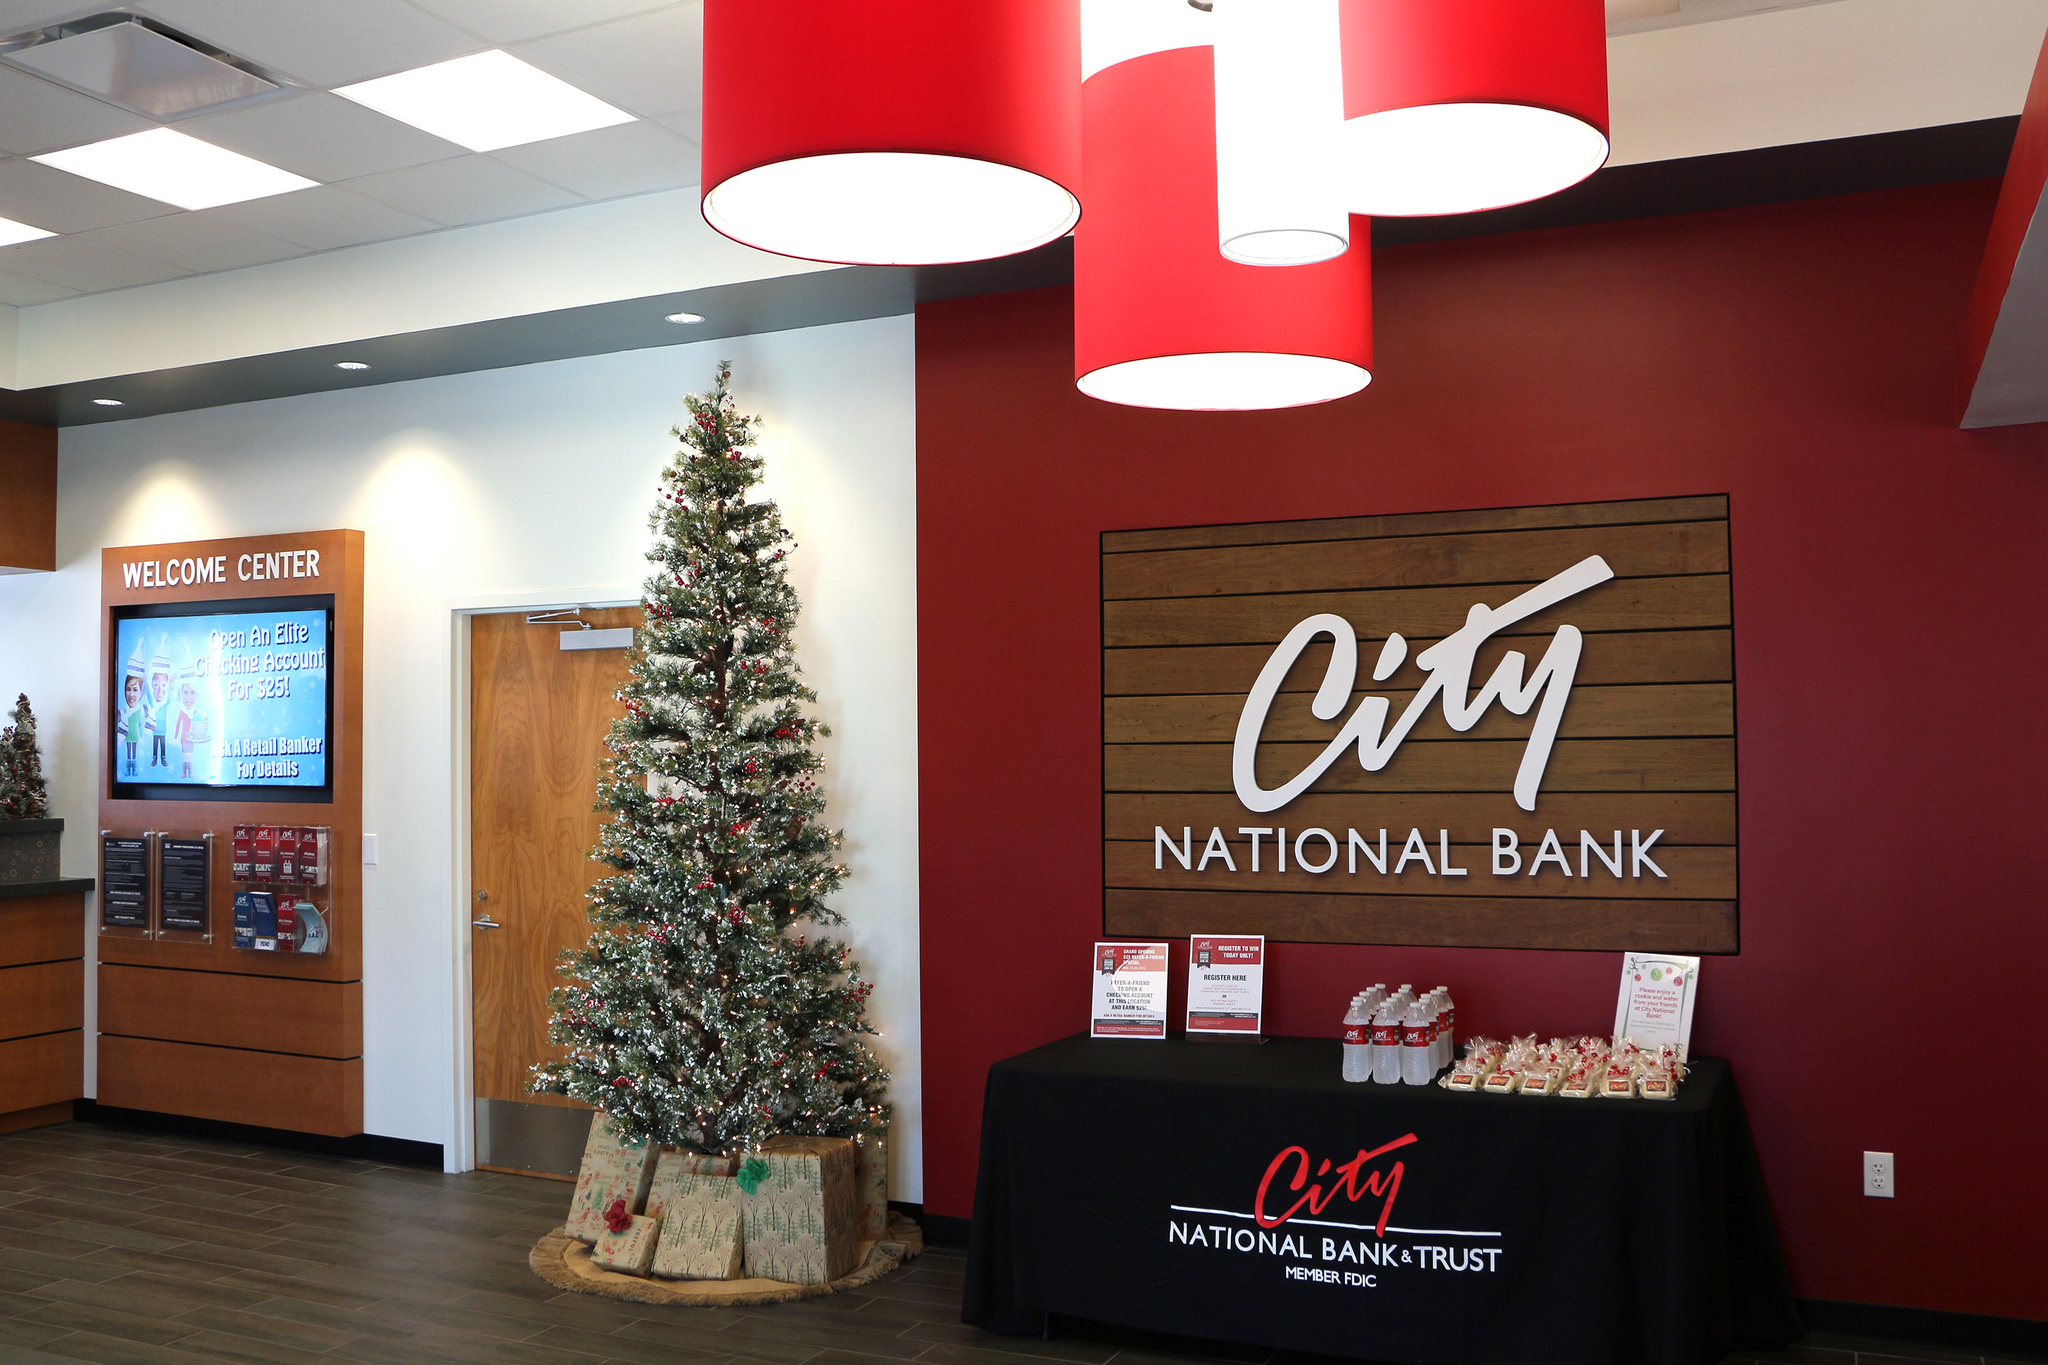 City National Bank & Trust ATM - Tulsa, OK